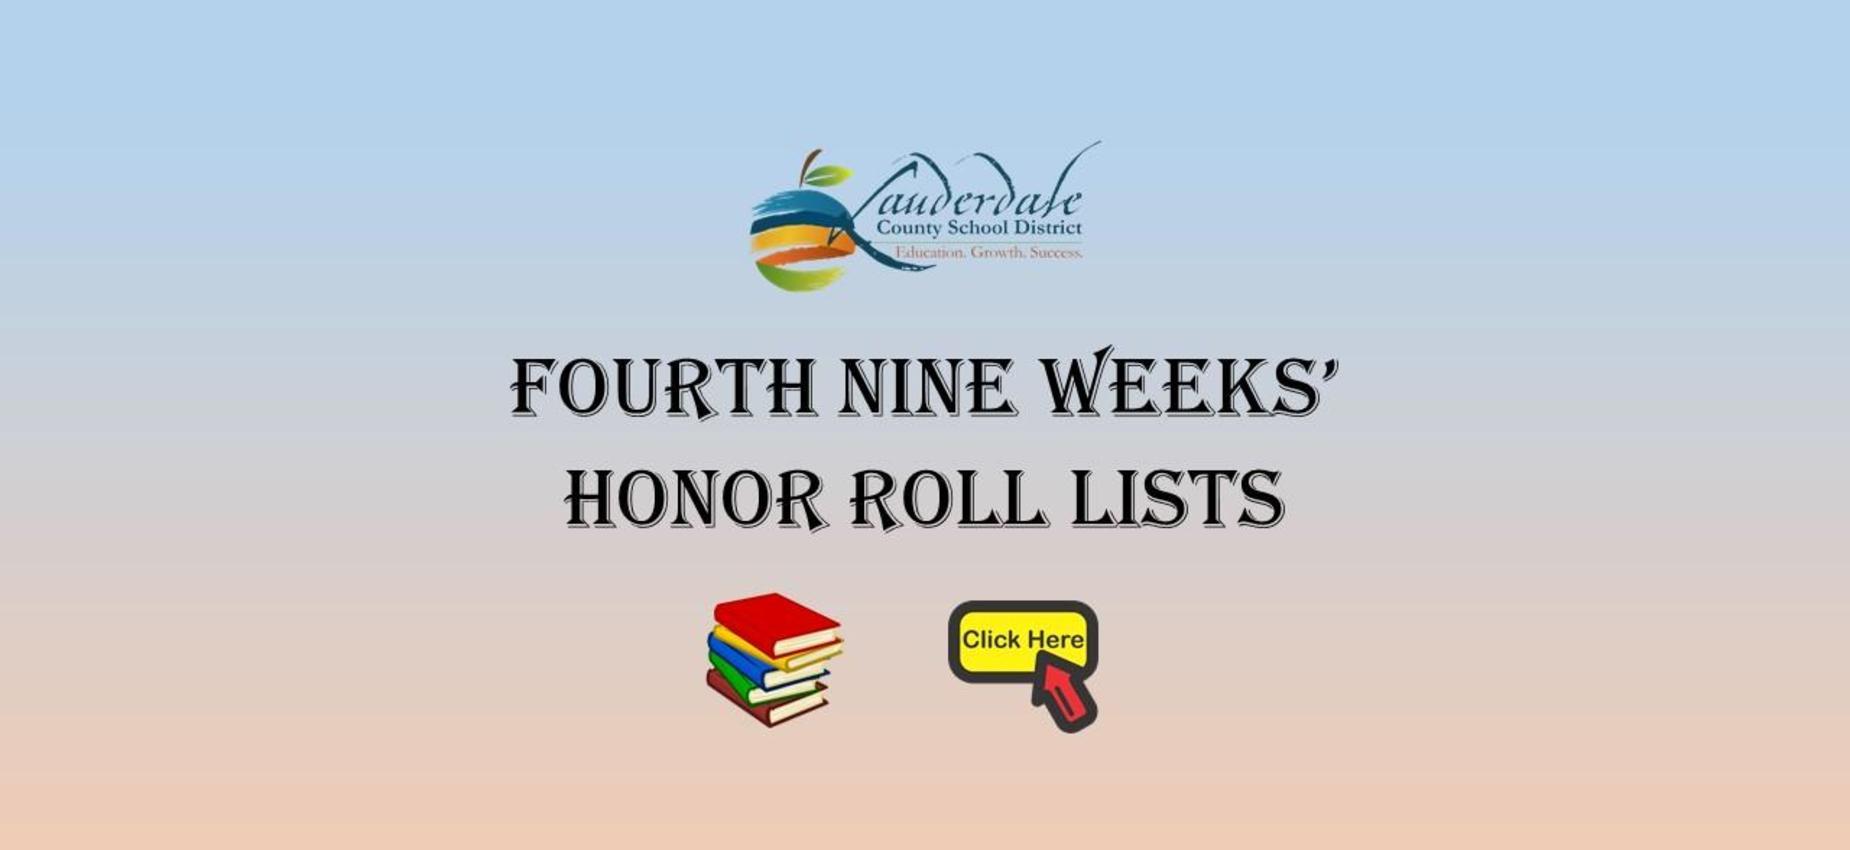 4th Nine Weeks' Honor Roll Lists